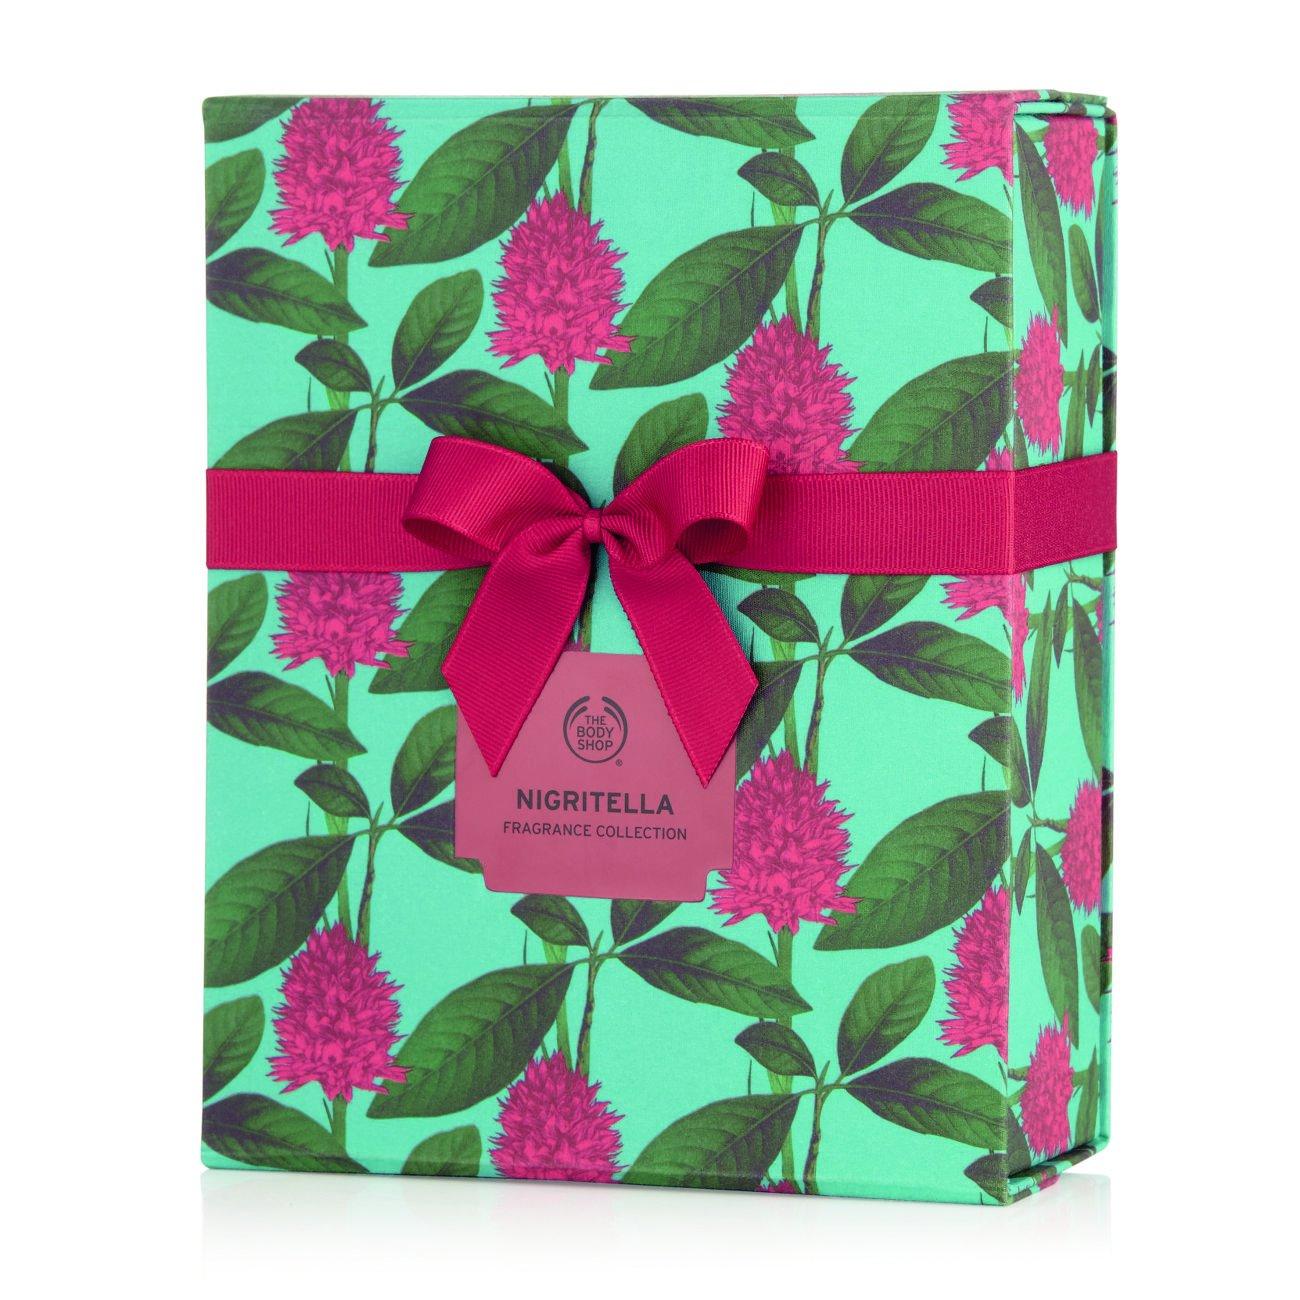 The Body Shop Elixirs of Nature Nigritella Fragrance Gift Set, 3pc Fragrance Gift Set